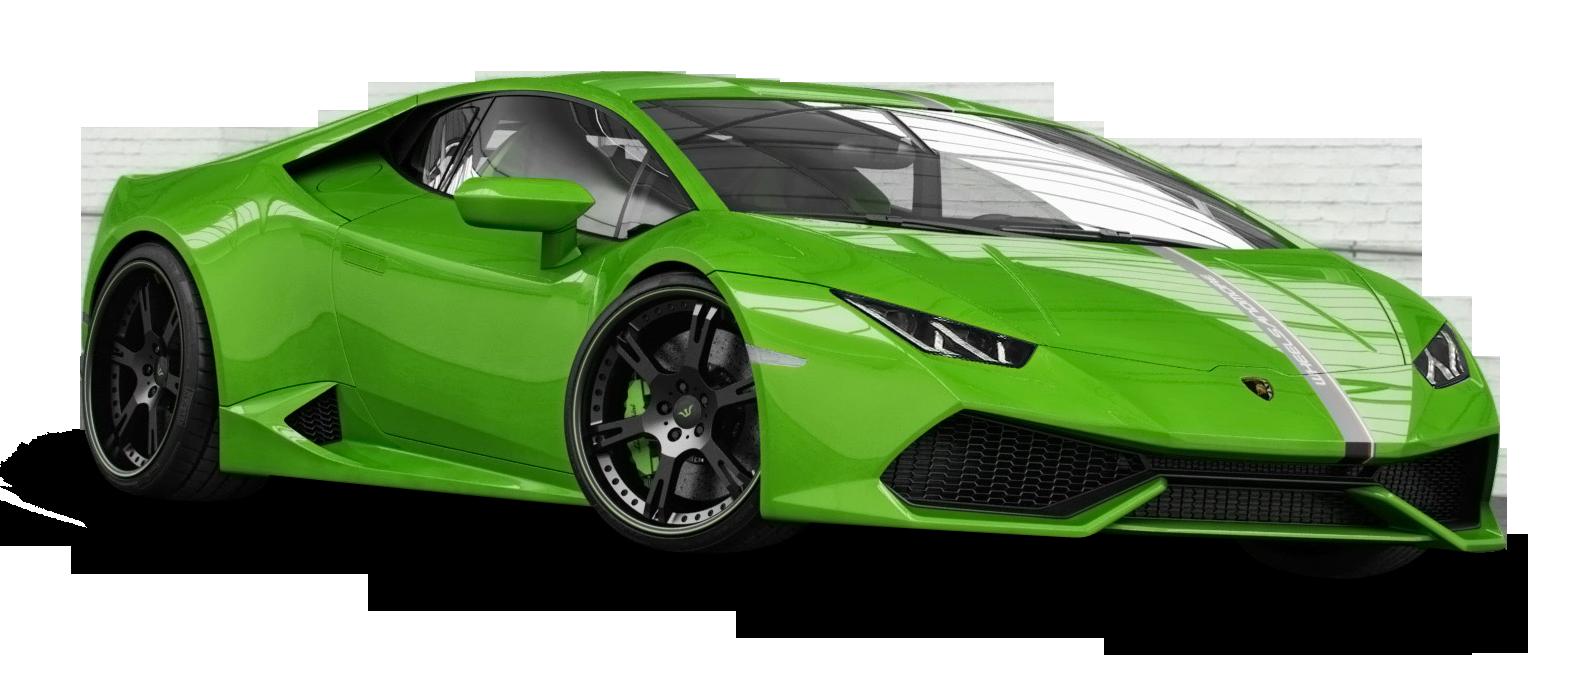 Lamborghini huracan png image. Green clipart sports car